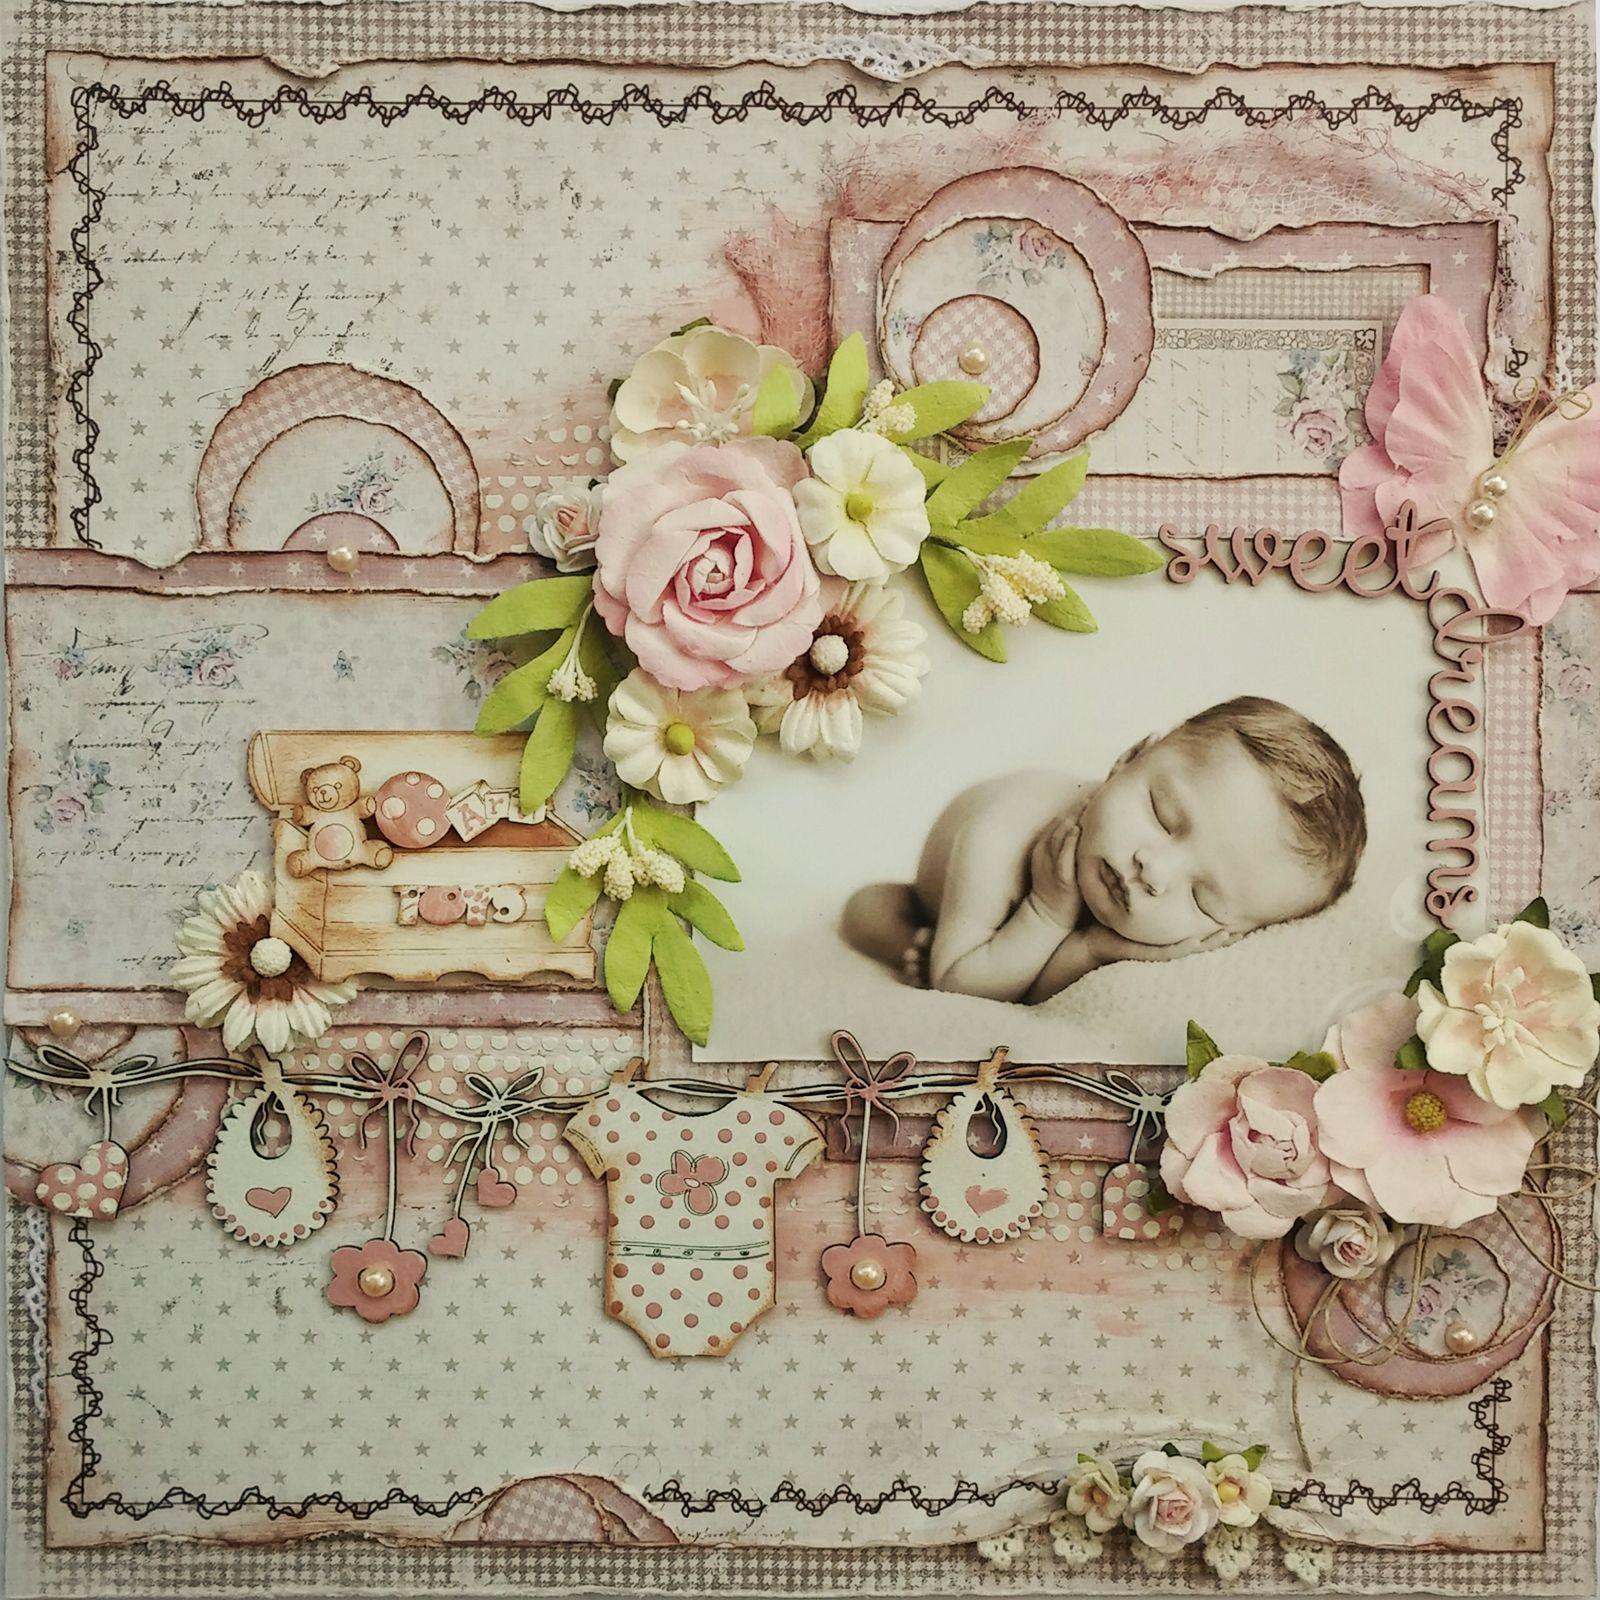 Sweet Dreams by Gabrielle Pollacco